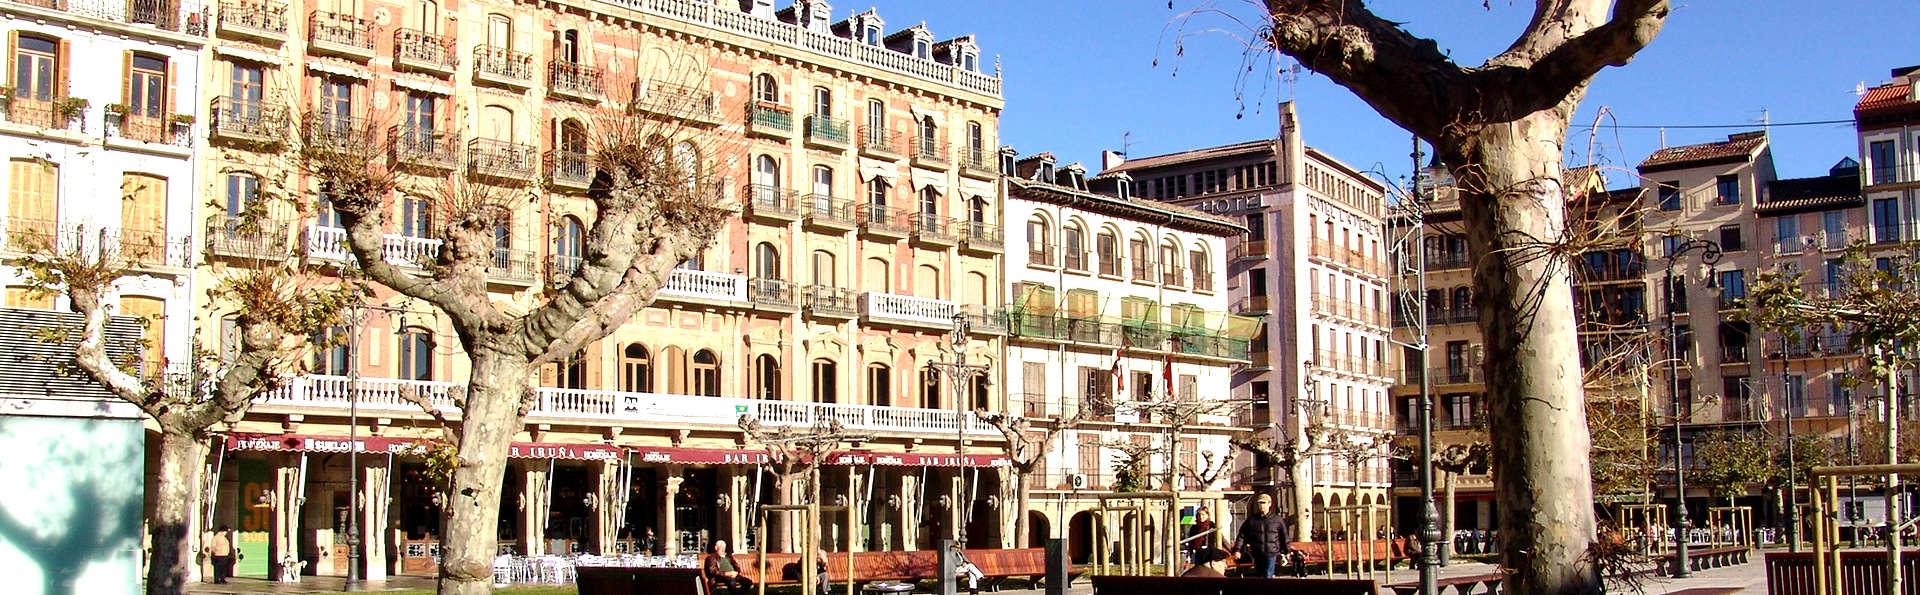 Hotel Casa Azcona - Edit_destination2.jpg